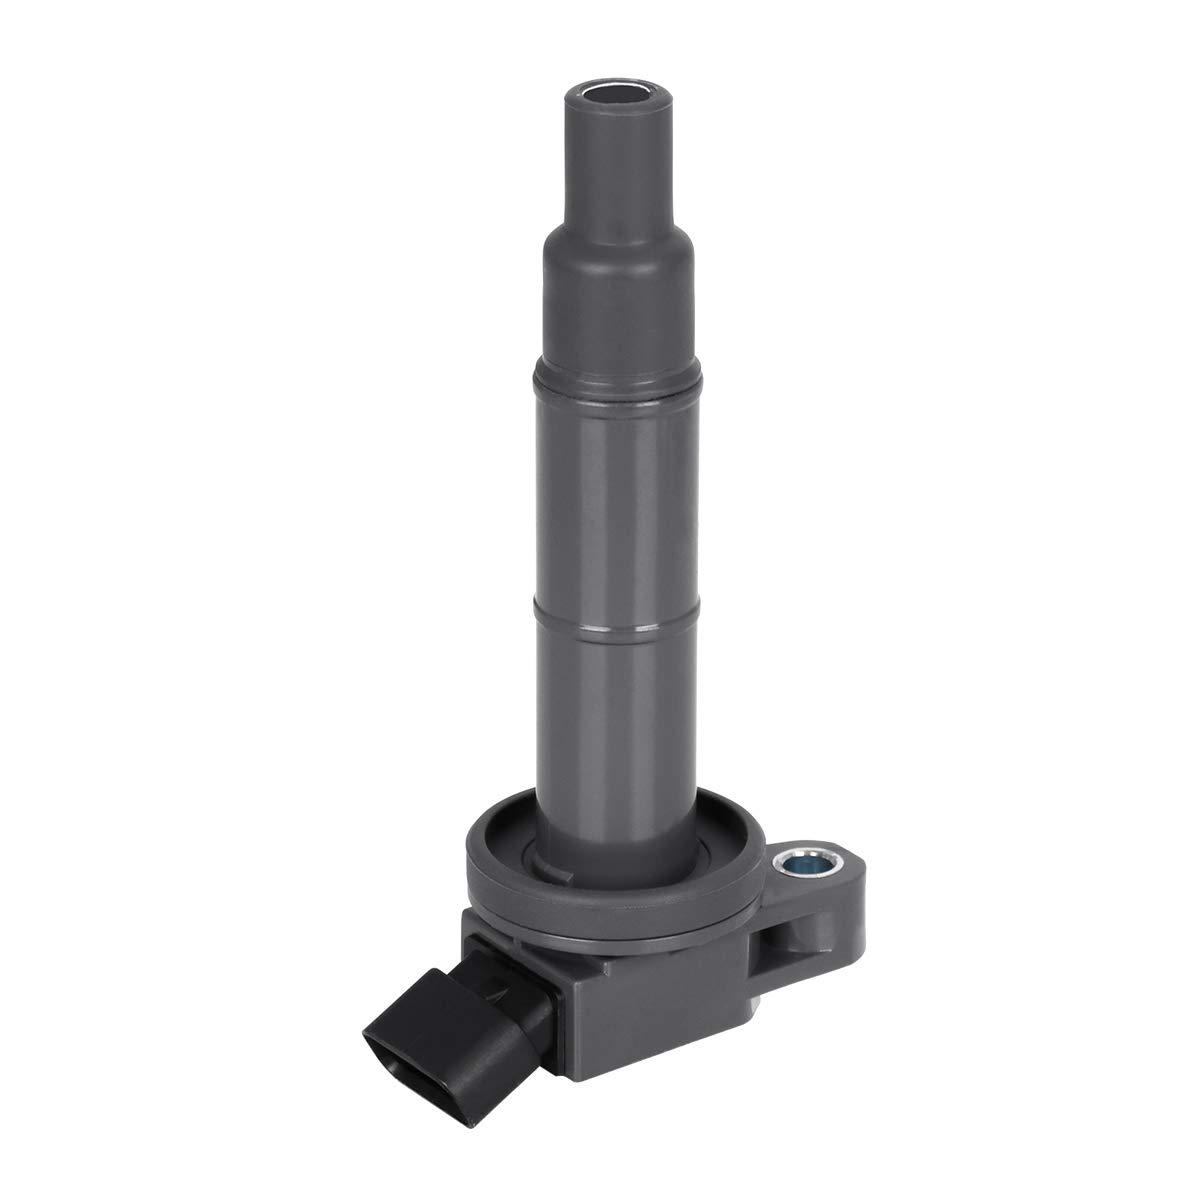 UF333 90919-02244 C1330 6731307 FAERSI Ignition Coil Pack of 1 for 2.4L Toyota Camry Highlander RAV4 Scion tC